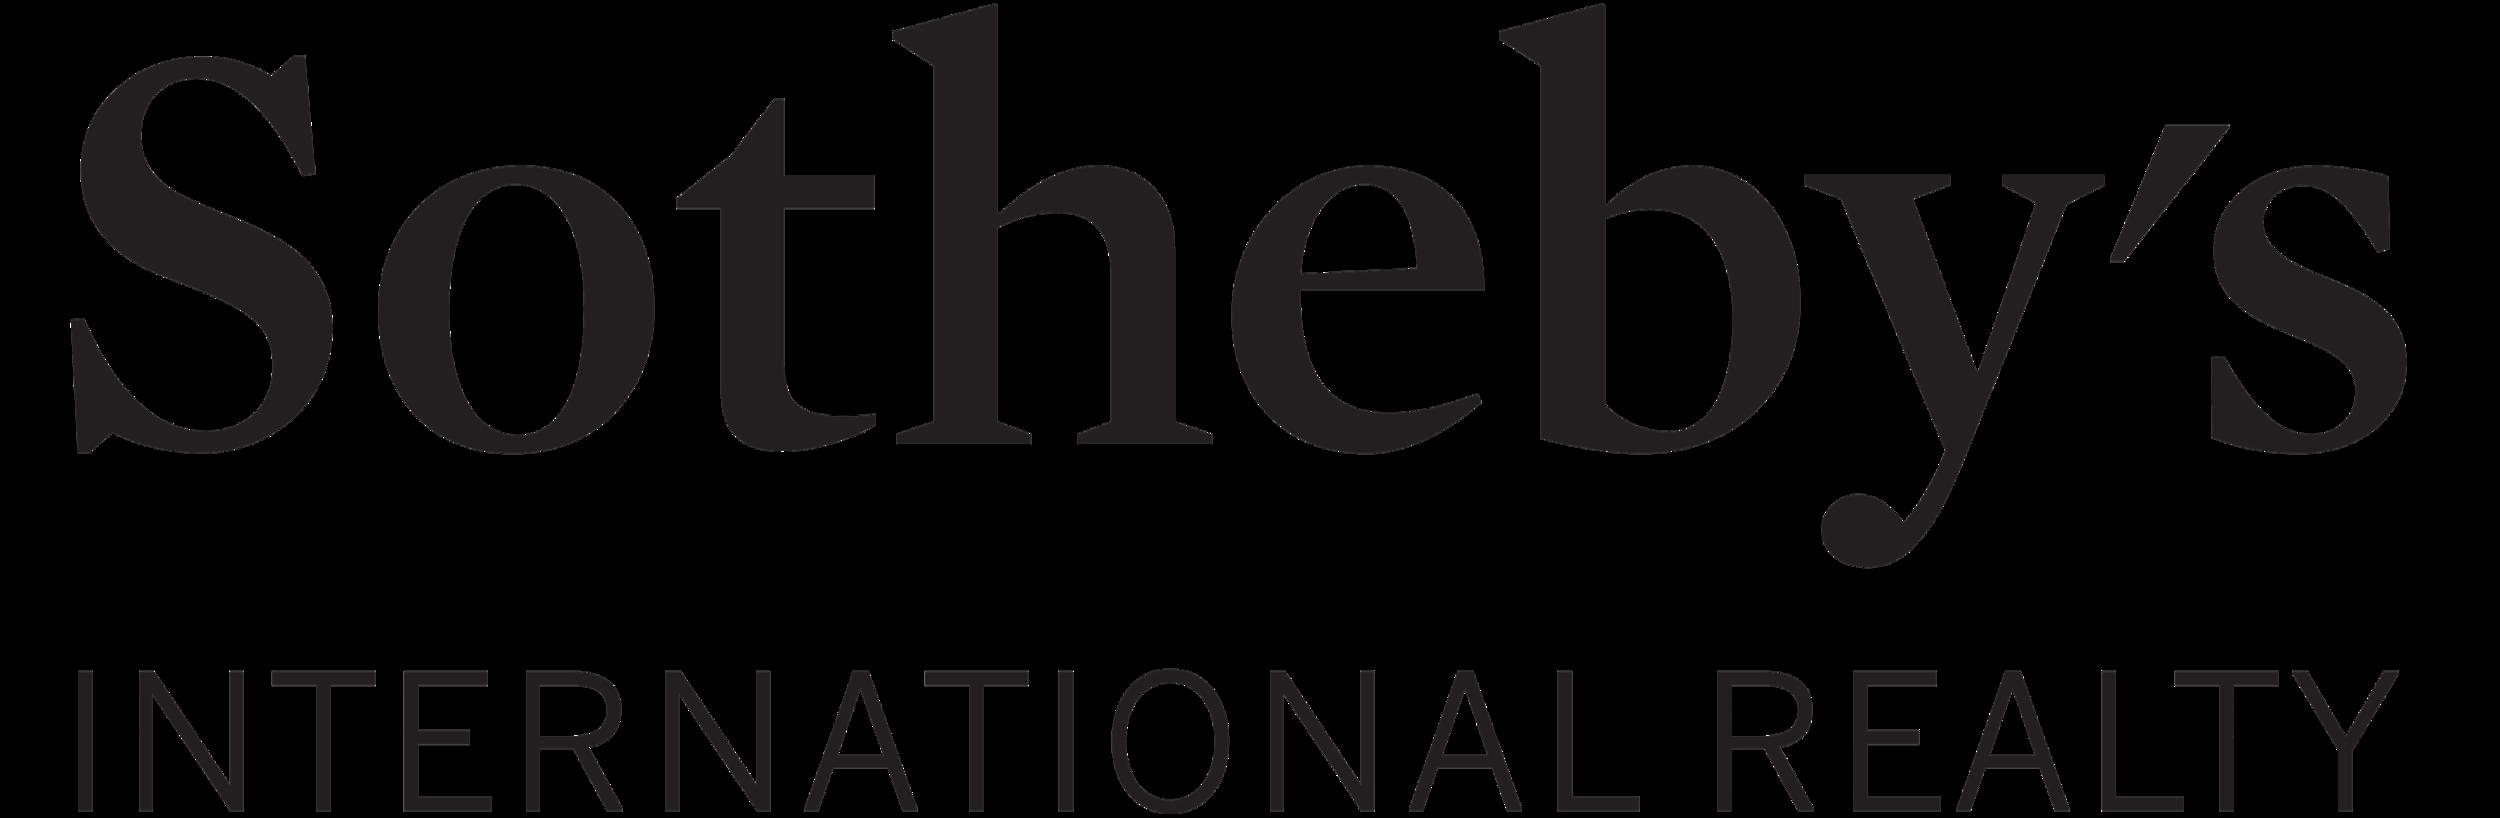 Sothebys_Realty_logo_logotype.png